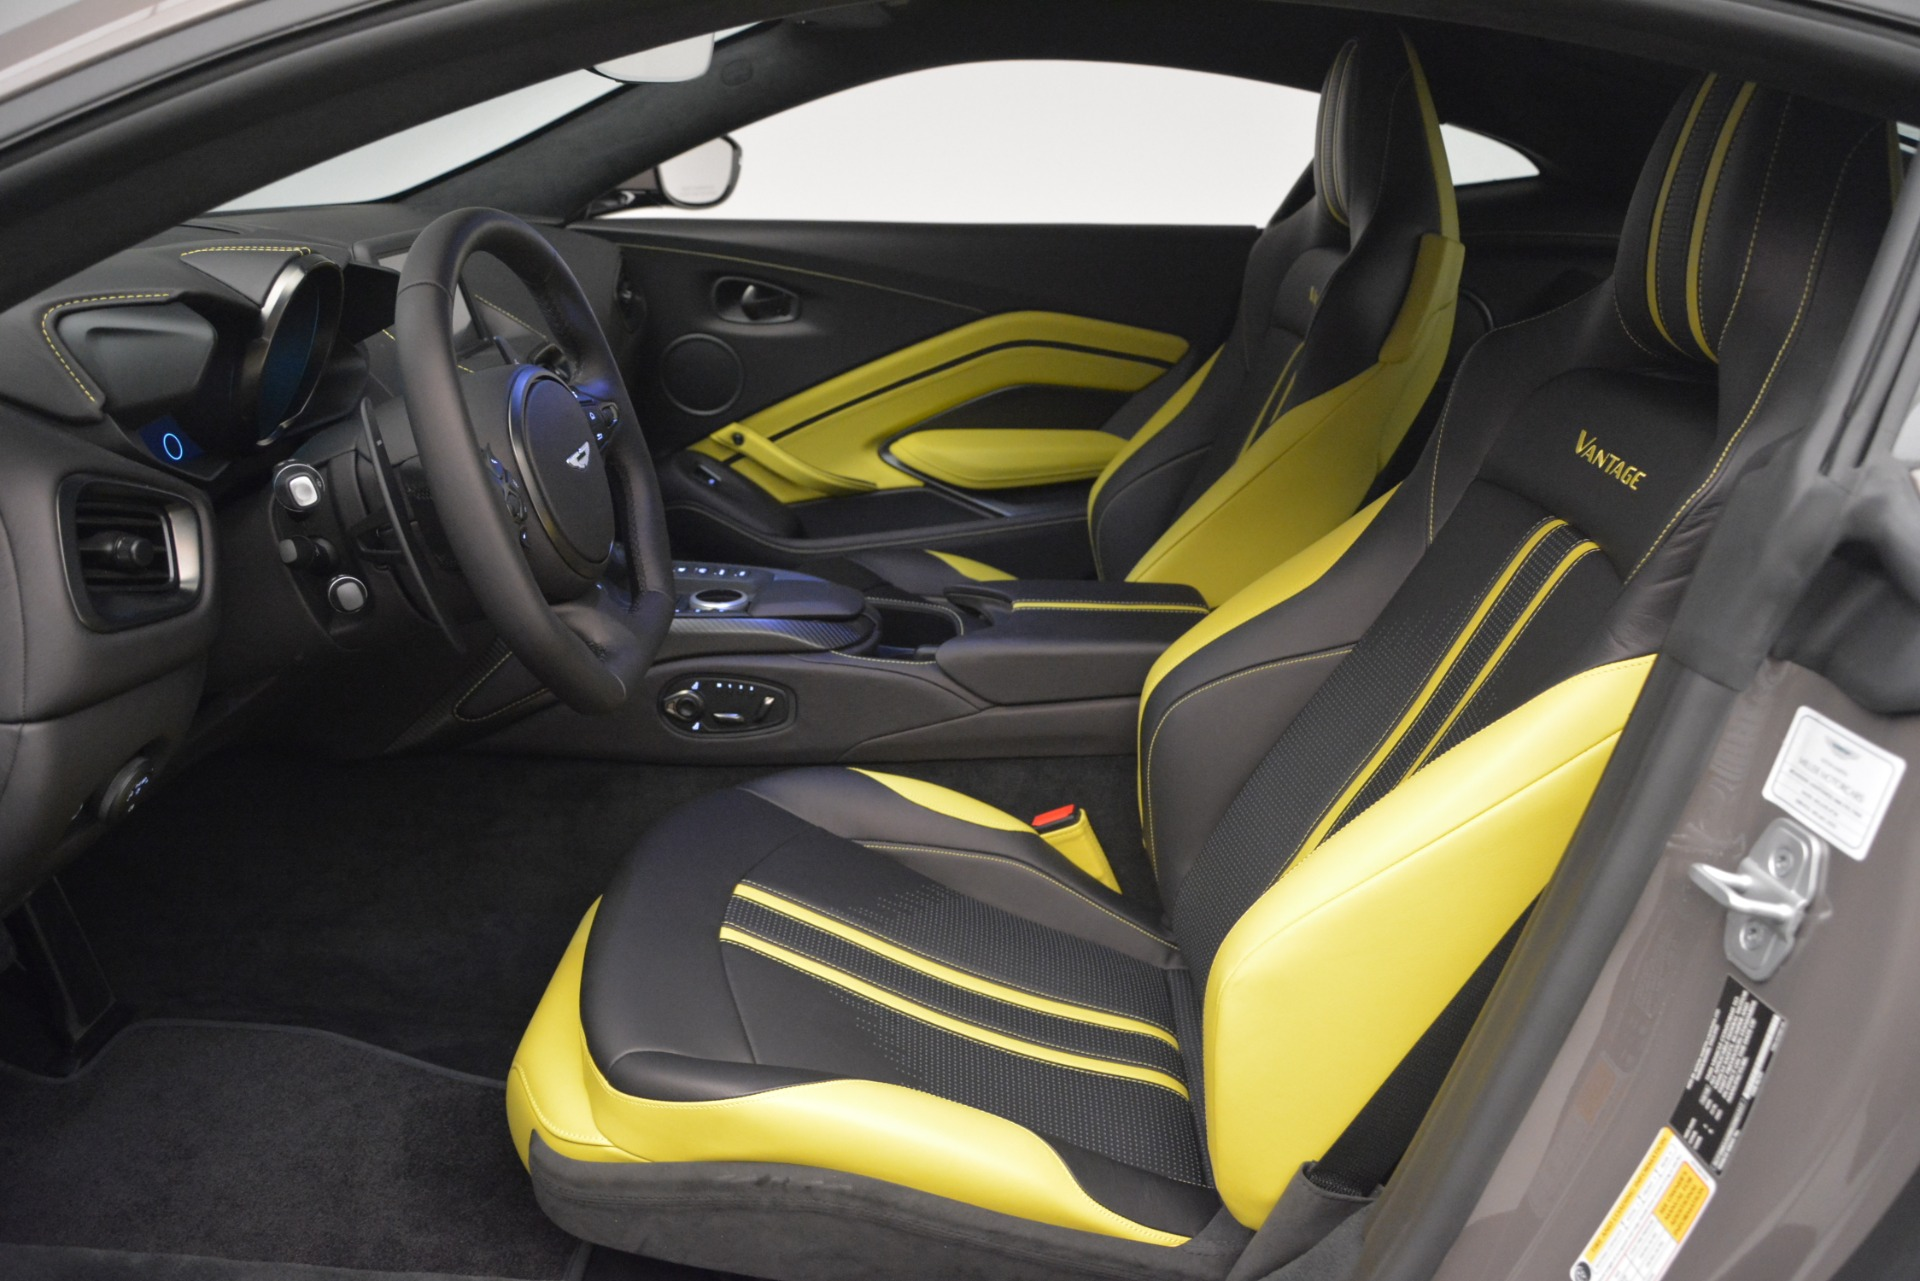 Used 2019 Aston Martin Vantage Coupe For Sale In Greenwich, CT. Alfa Romeo of Greenwich, A1339 2901_p13